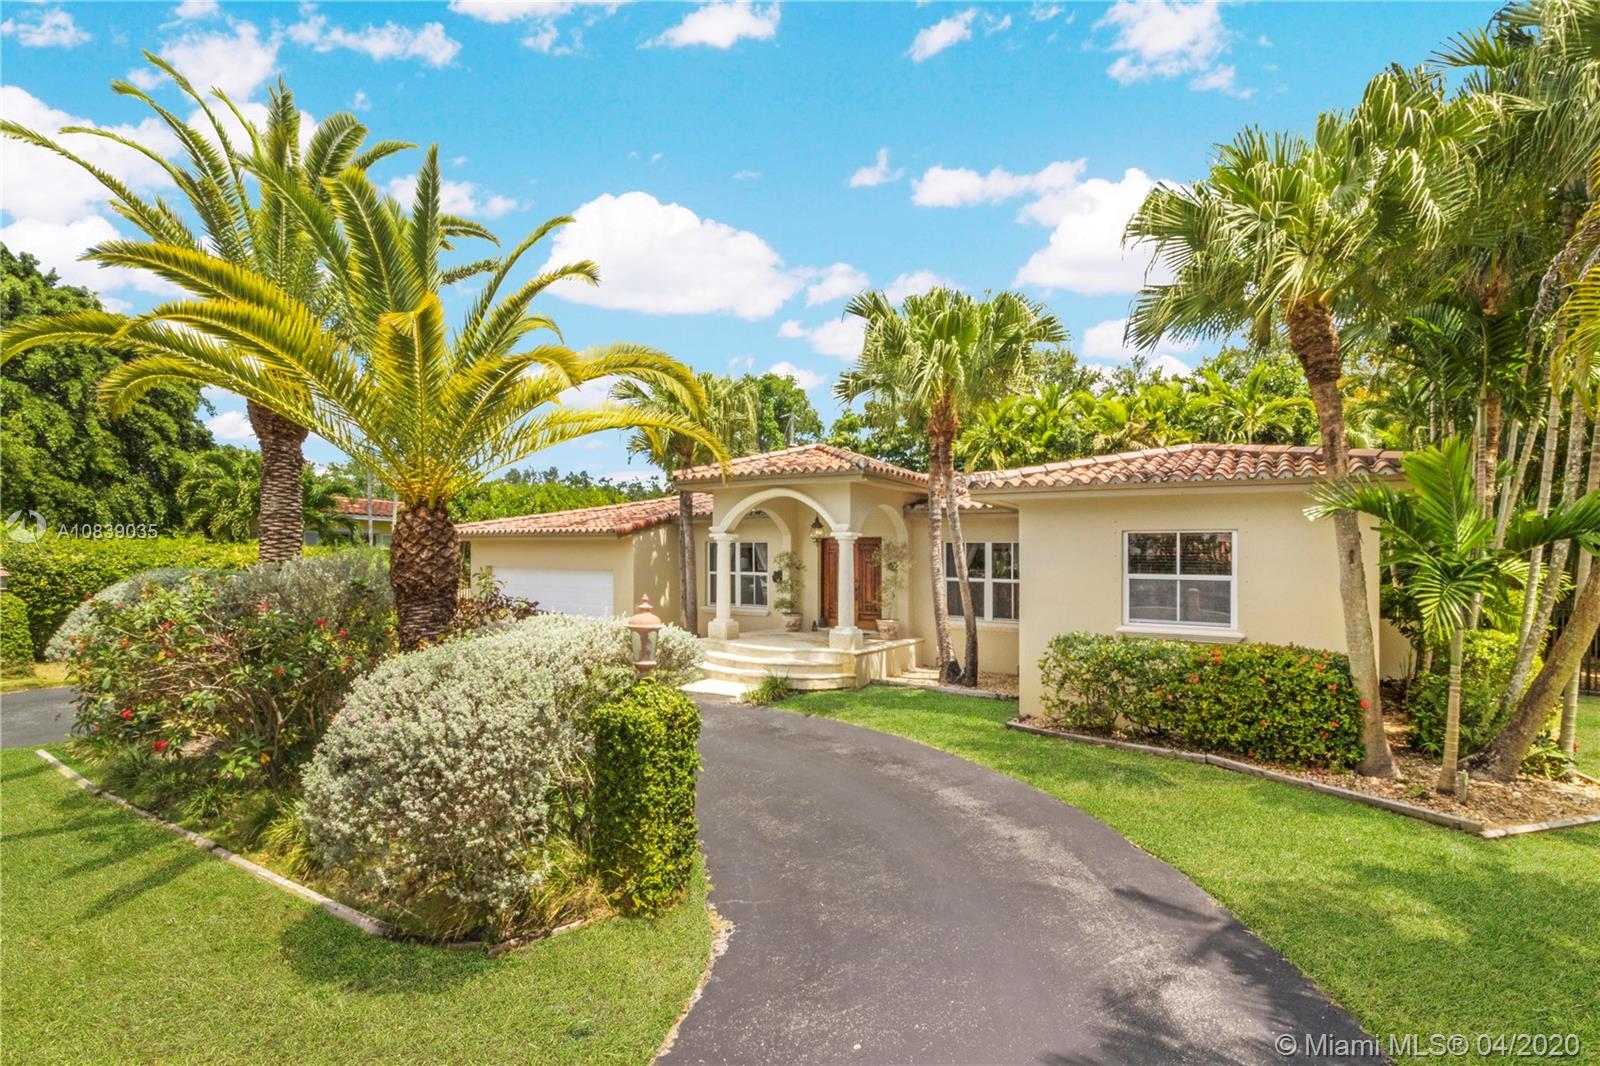 4511 Alhambra Cir, Coral Gables, Florida 33146, 4 Bedrooms Bedrooms, ,3 BathroomsBathrooms,Residential,For Sale,4511 Alhambra Cir,A10839035